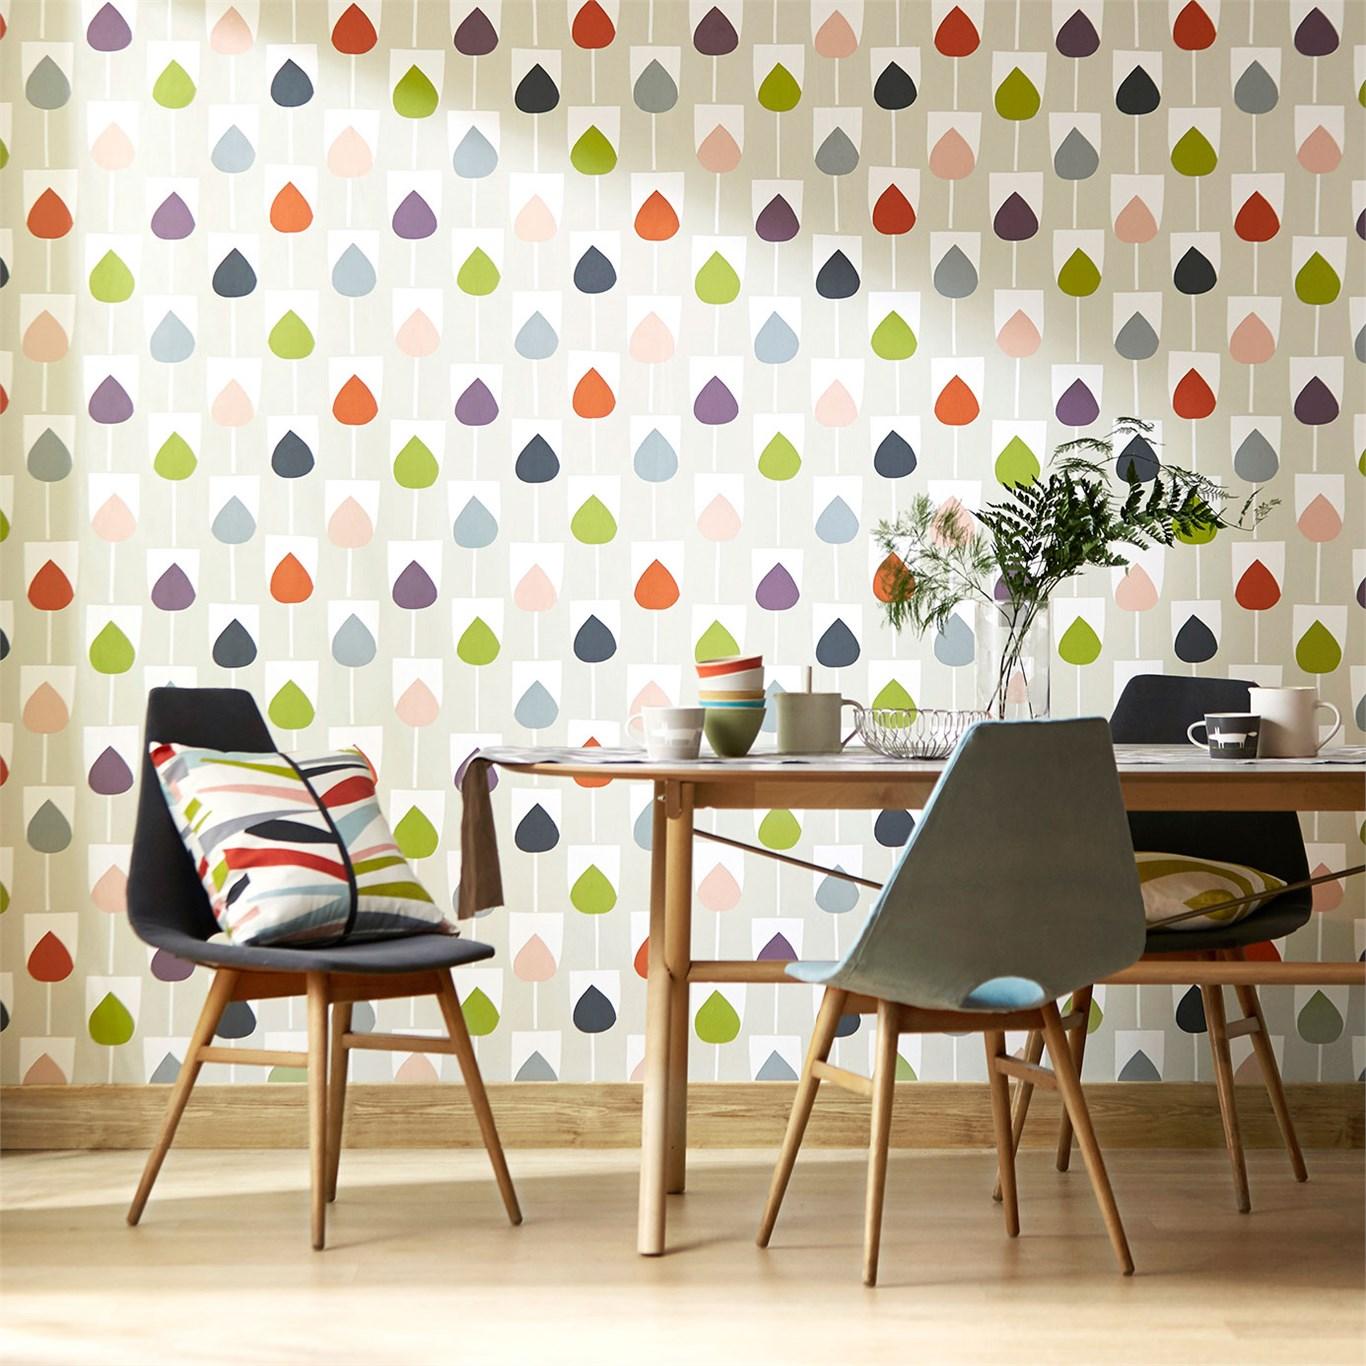 https://www.scion.uk.com/shop/wallpaper/lohko-wallpapers/sula/?act=ssocomplete